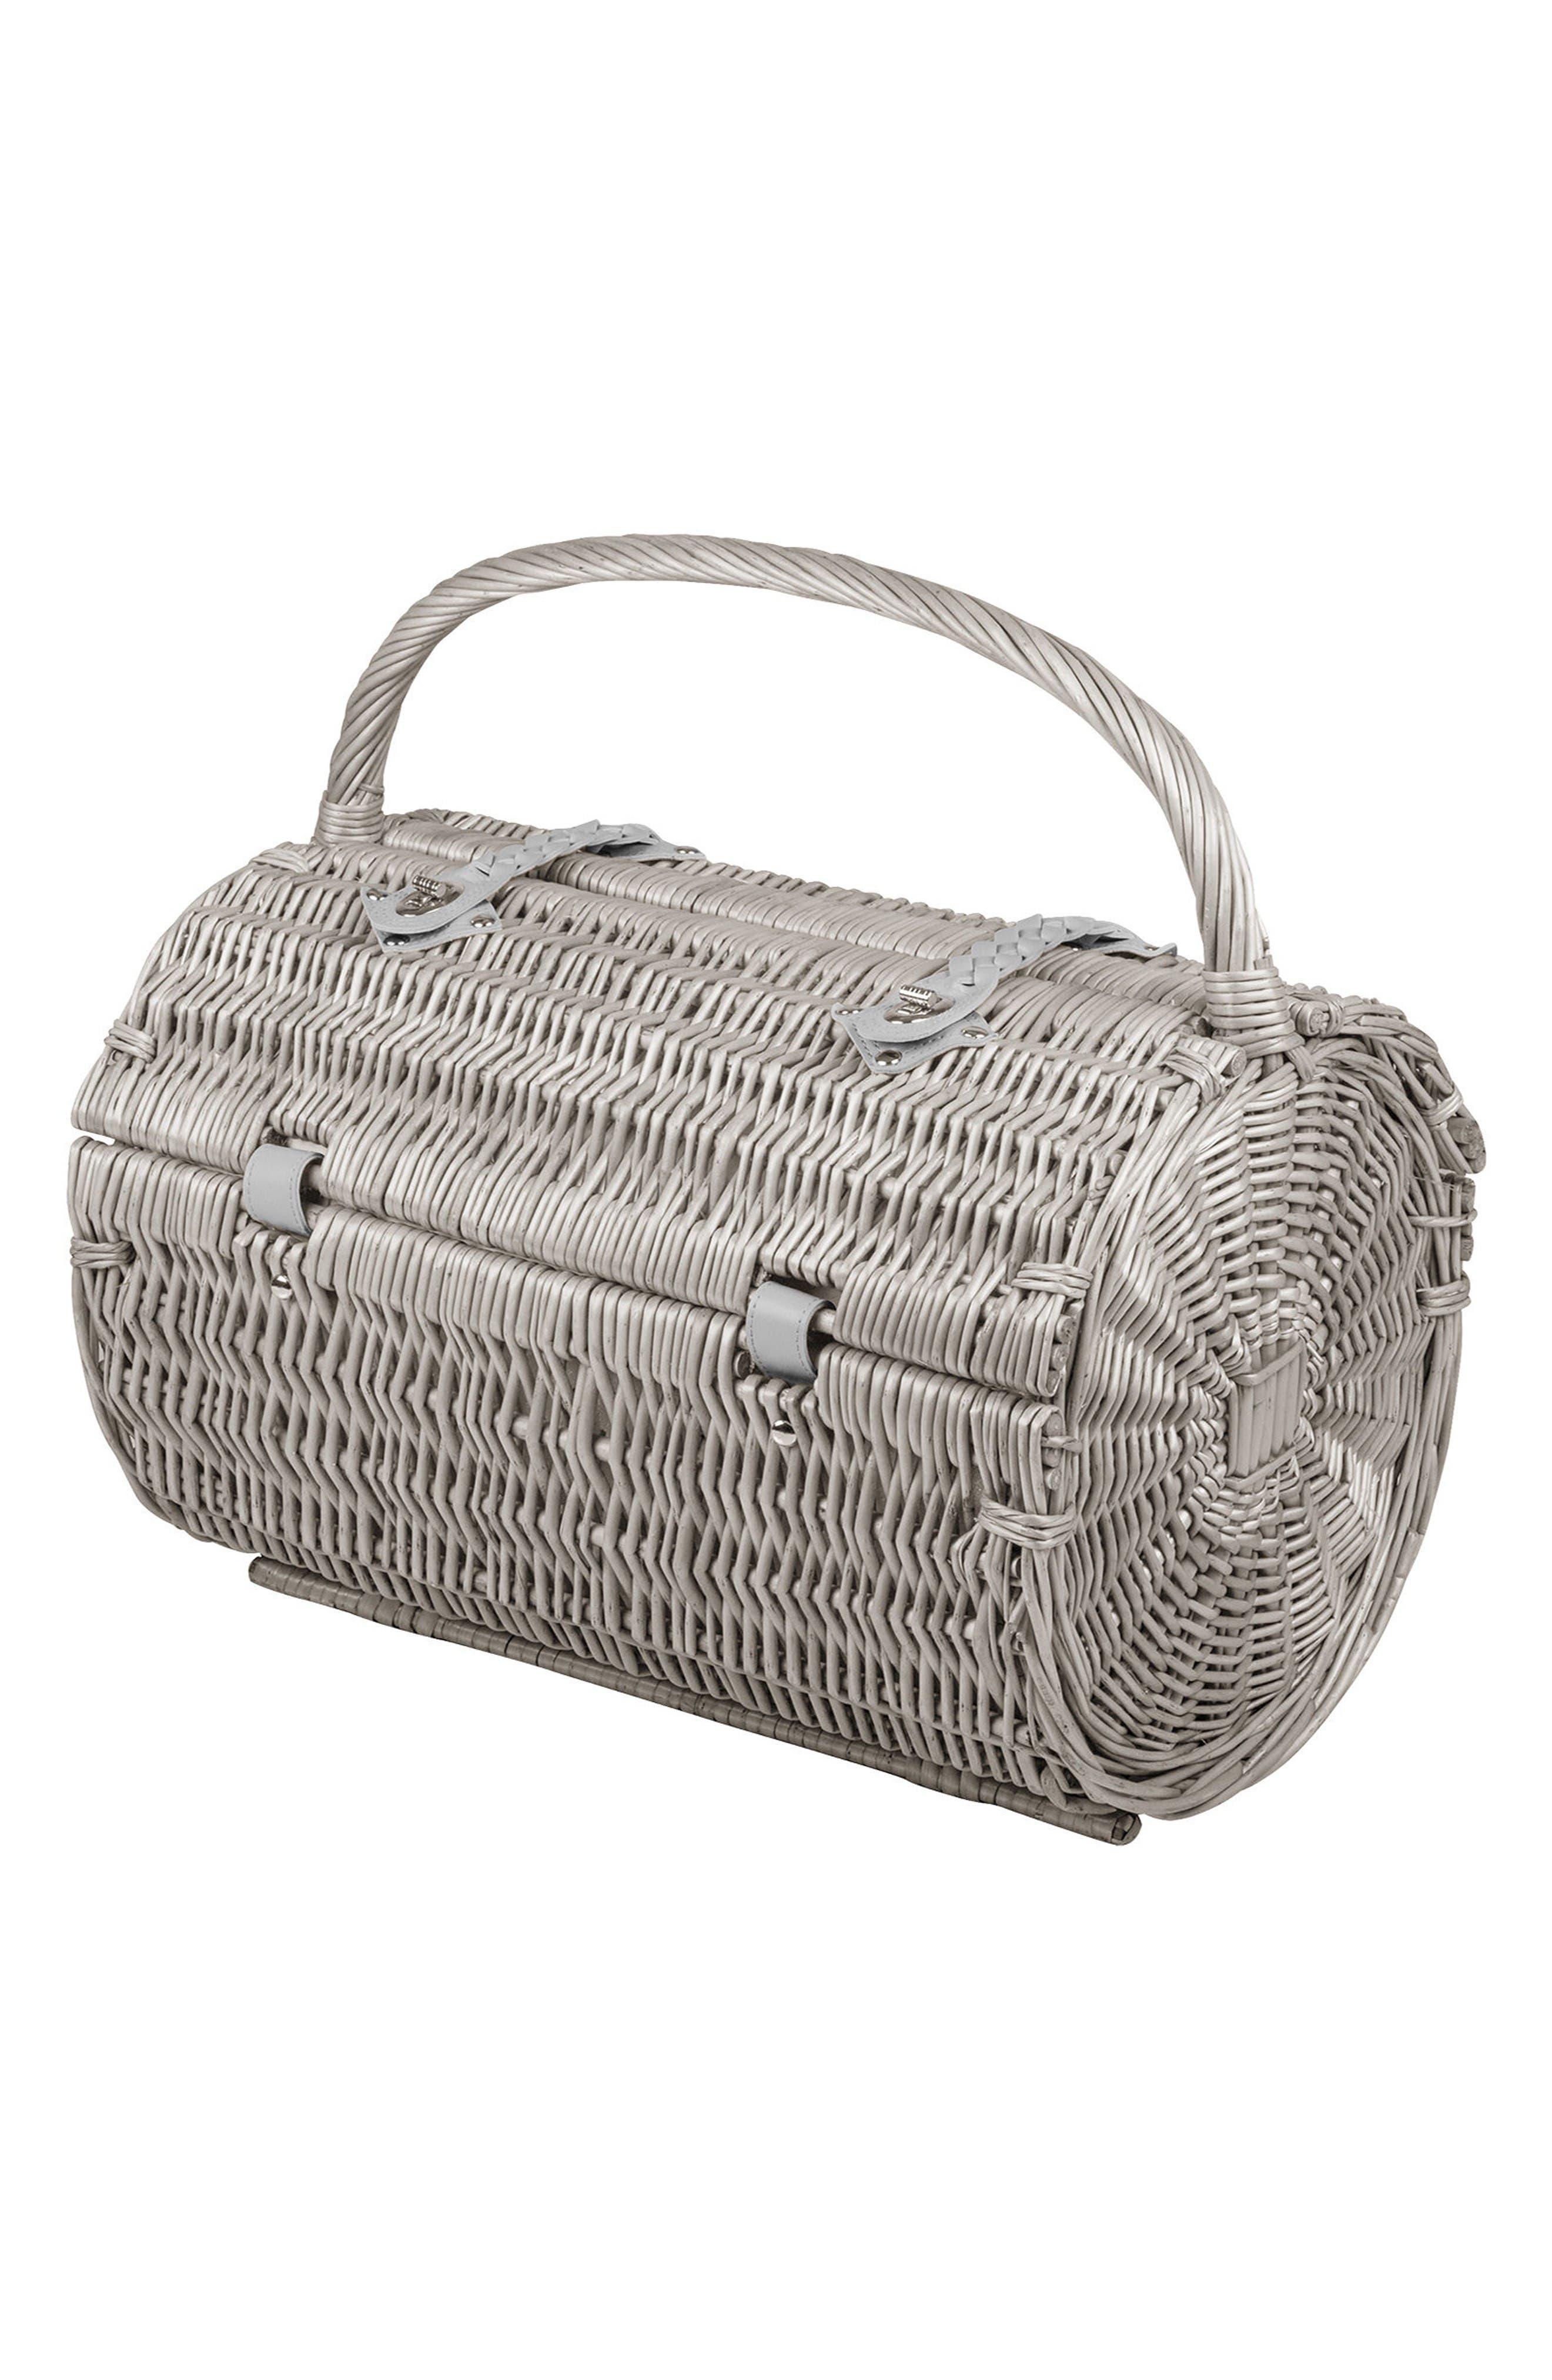 Alternate Image 2  - Picnic Time Wicker Barrel Picnic Basket